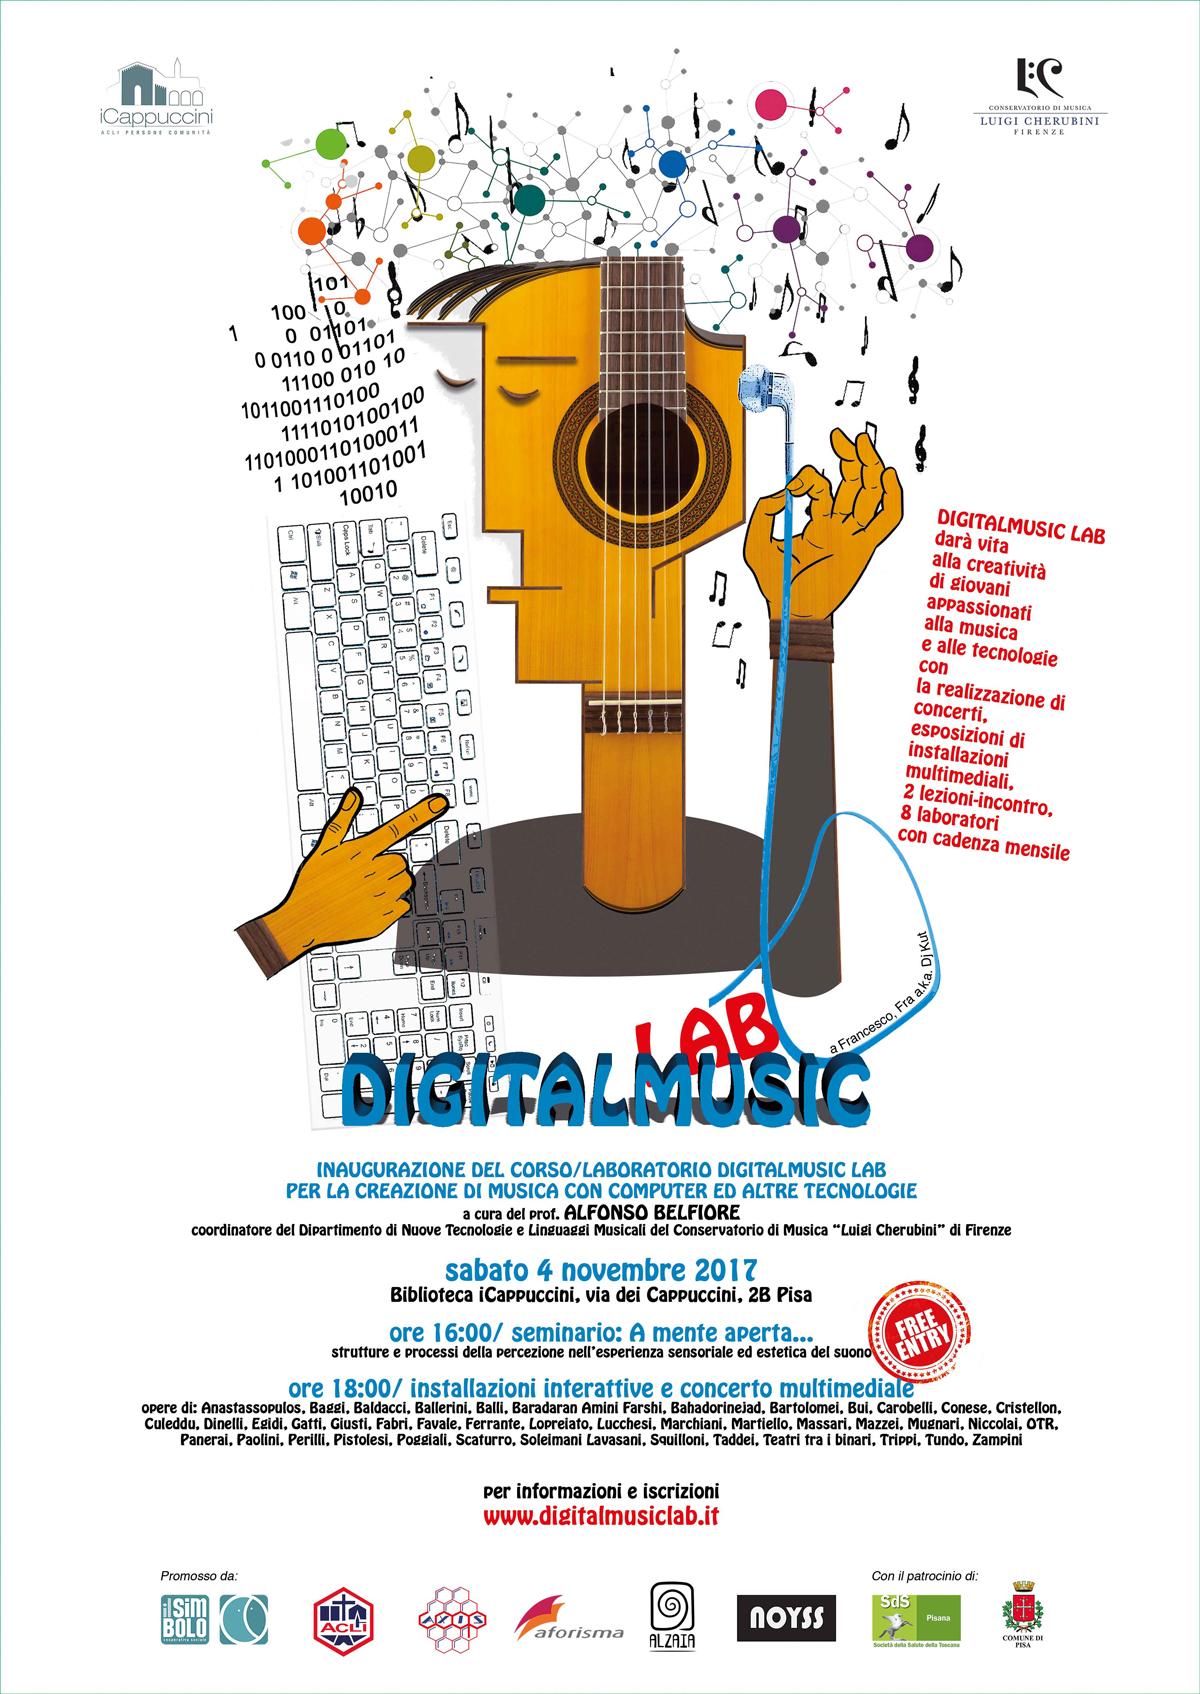 digitalmusic-lab-manifesto-for-web